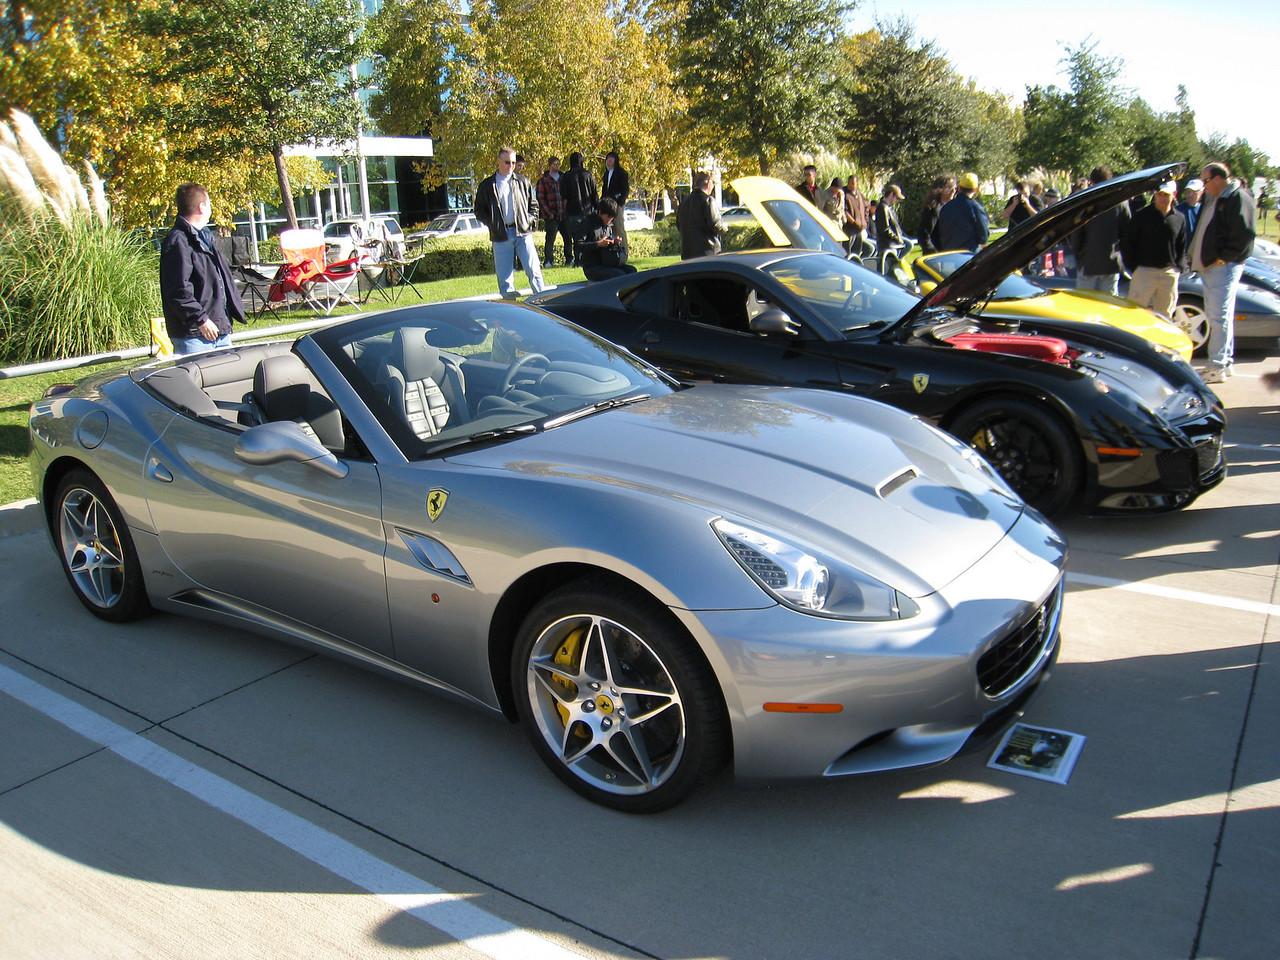 Ferrari GT California (gray) next to a Ferrari 599 GTO (black)